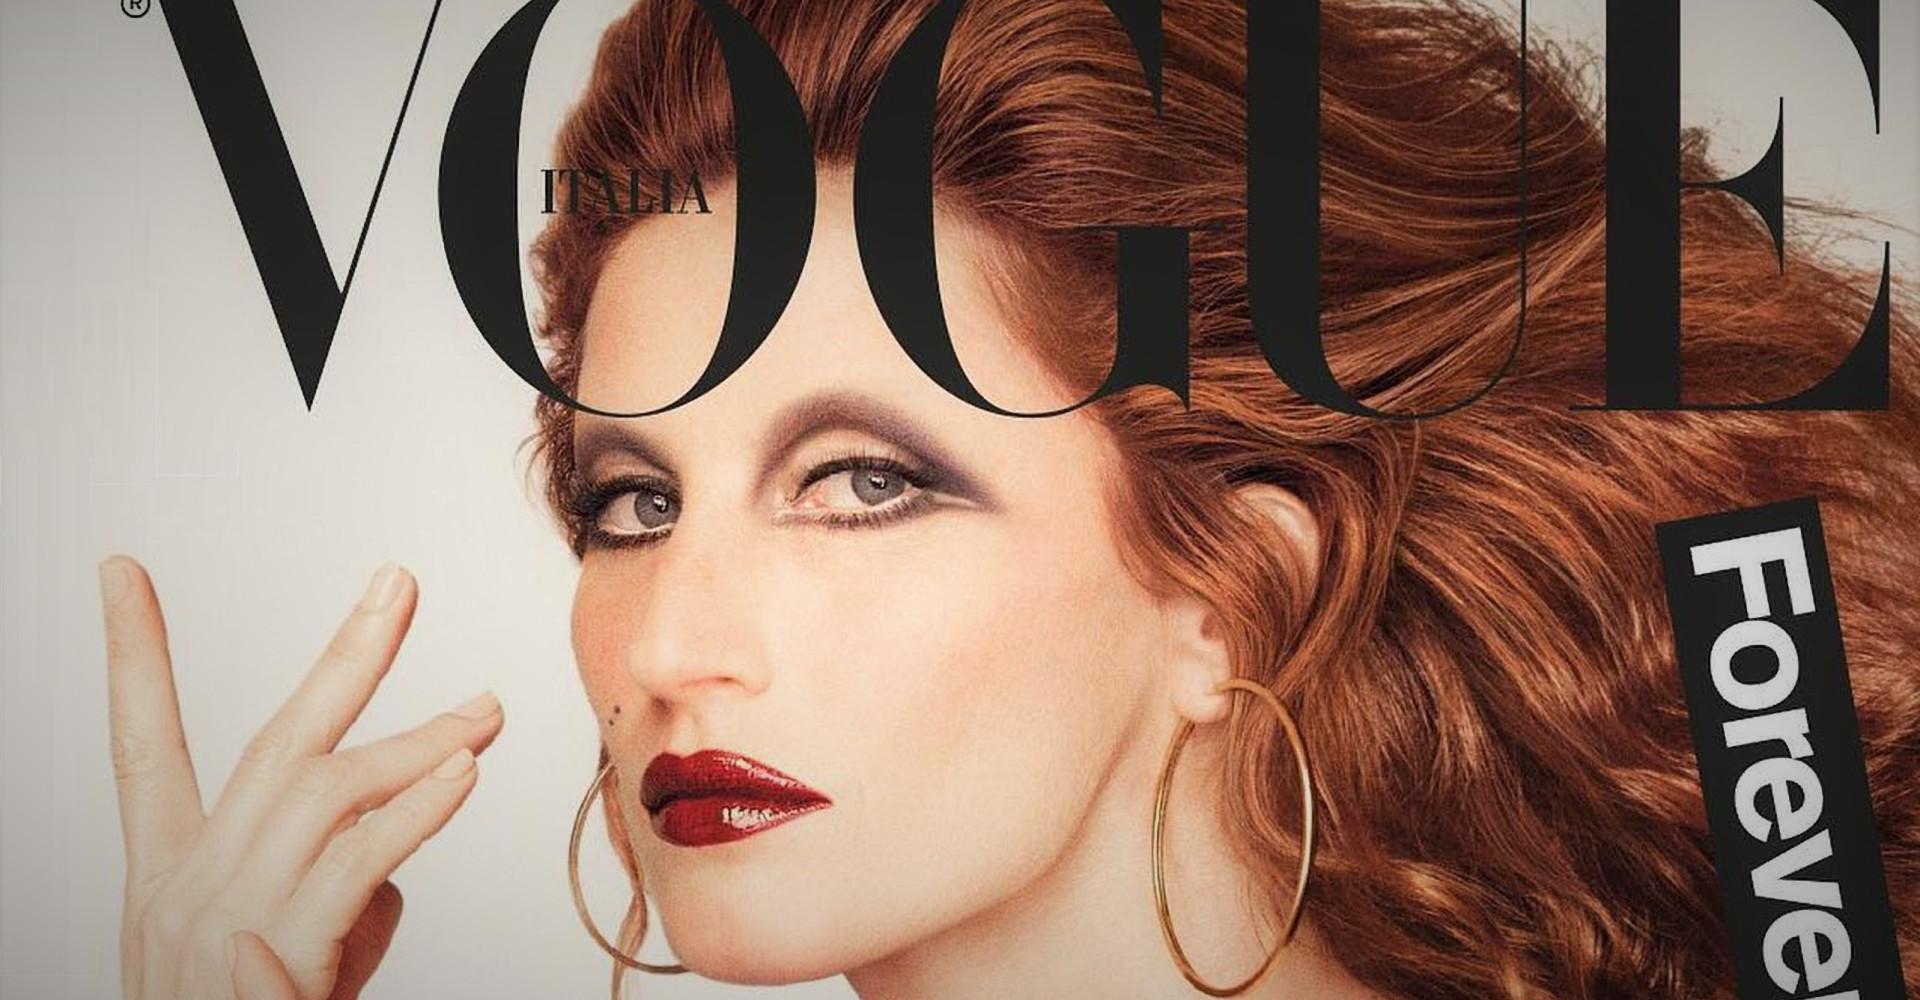 Gisele Bündchen surge irreconhecível na capa da Vogue